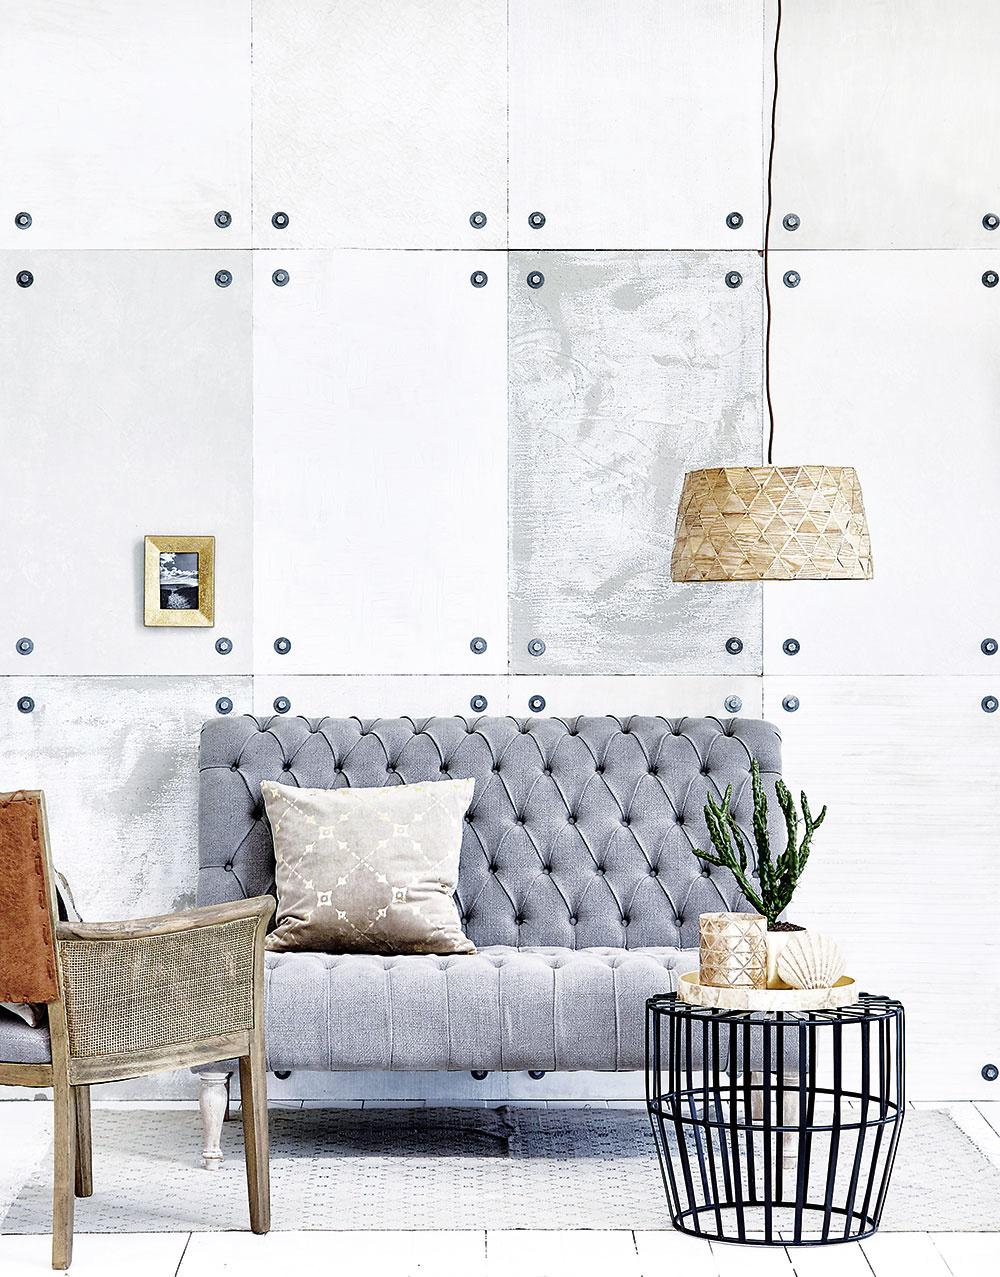 Vankúš Fabianne Square od značky Lene Bjerre, 50 % ľan, 50 % bavlna, 50 × 50 cm, 70,39 €, www.houseology.com